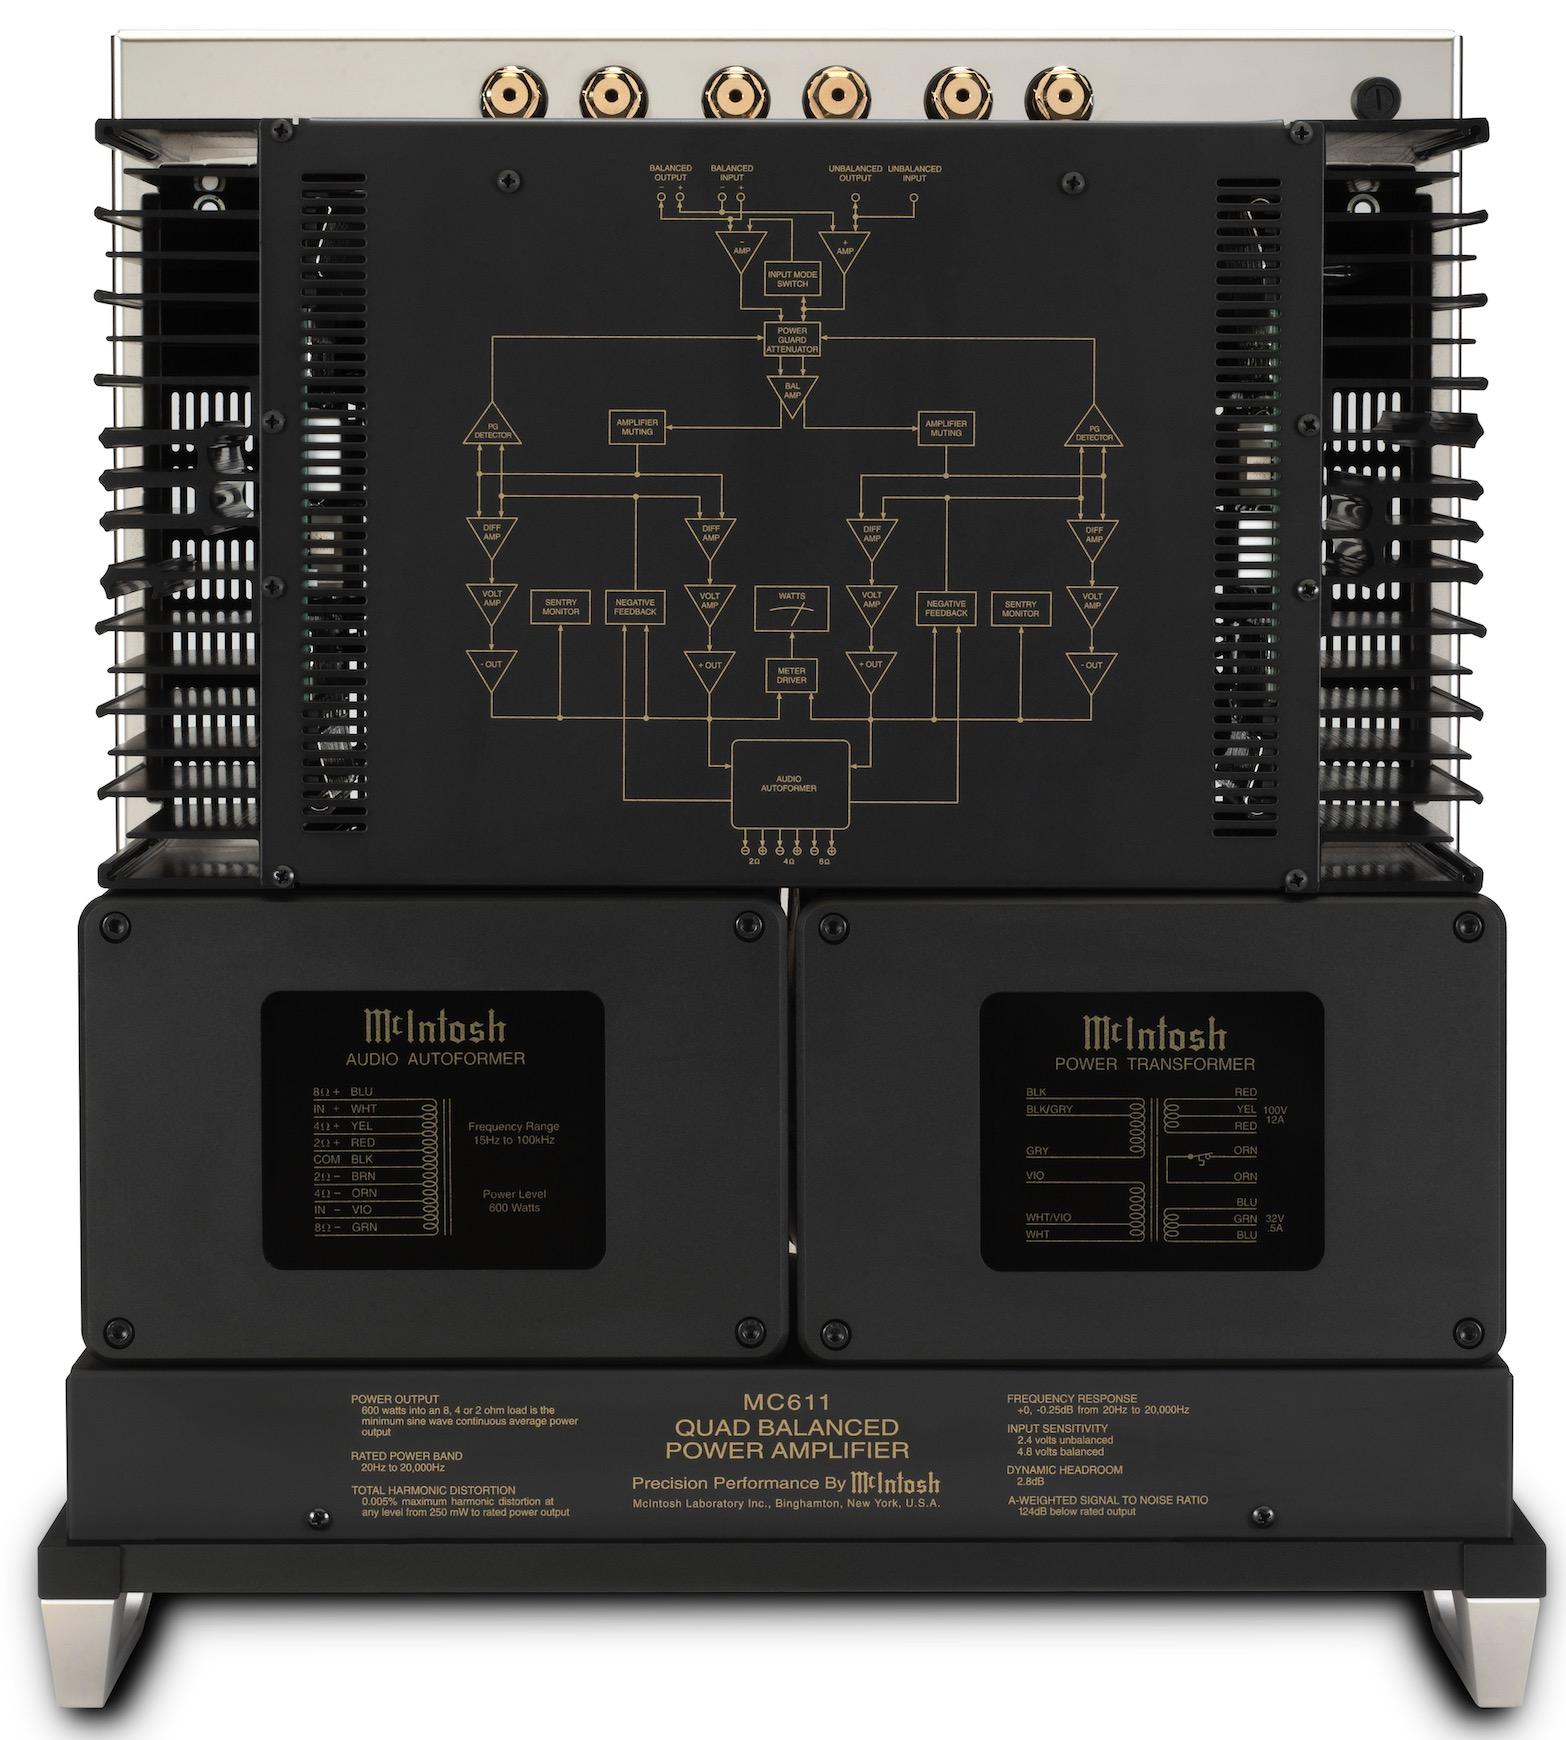 McIntosh MC611 Quad Balanced Power Amplifier